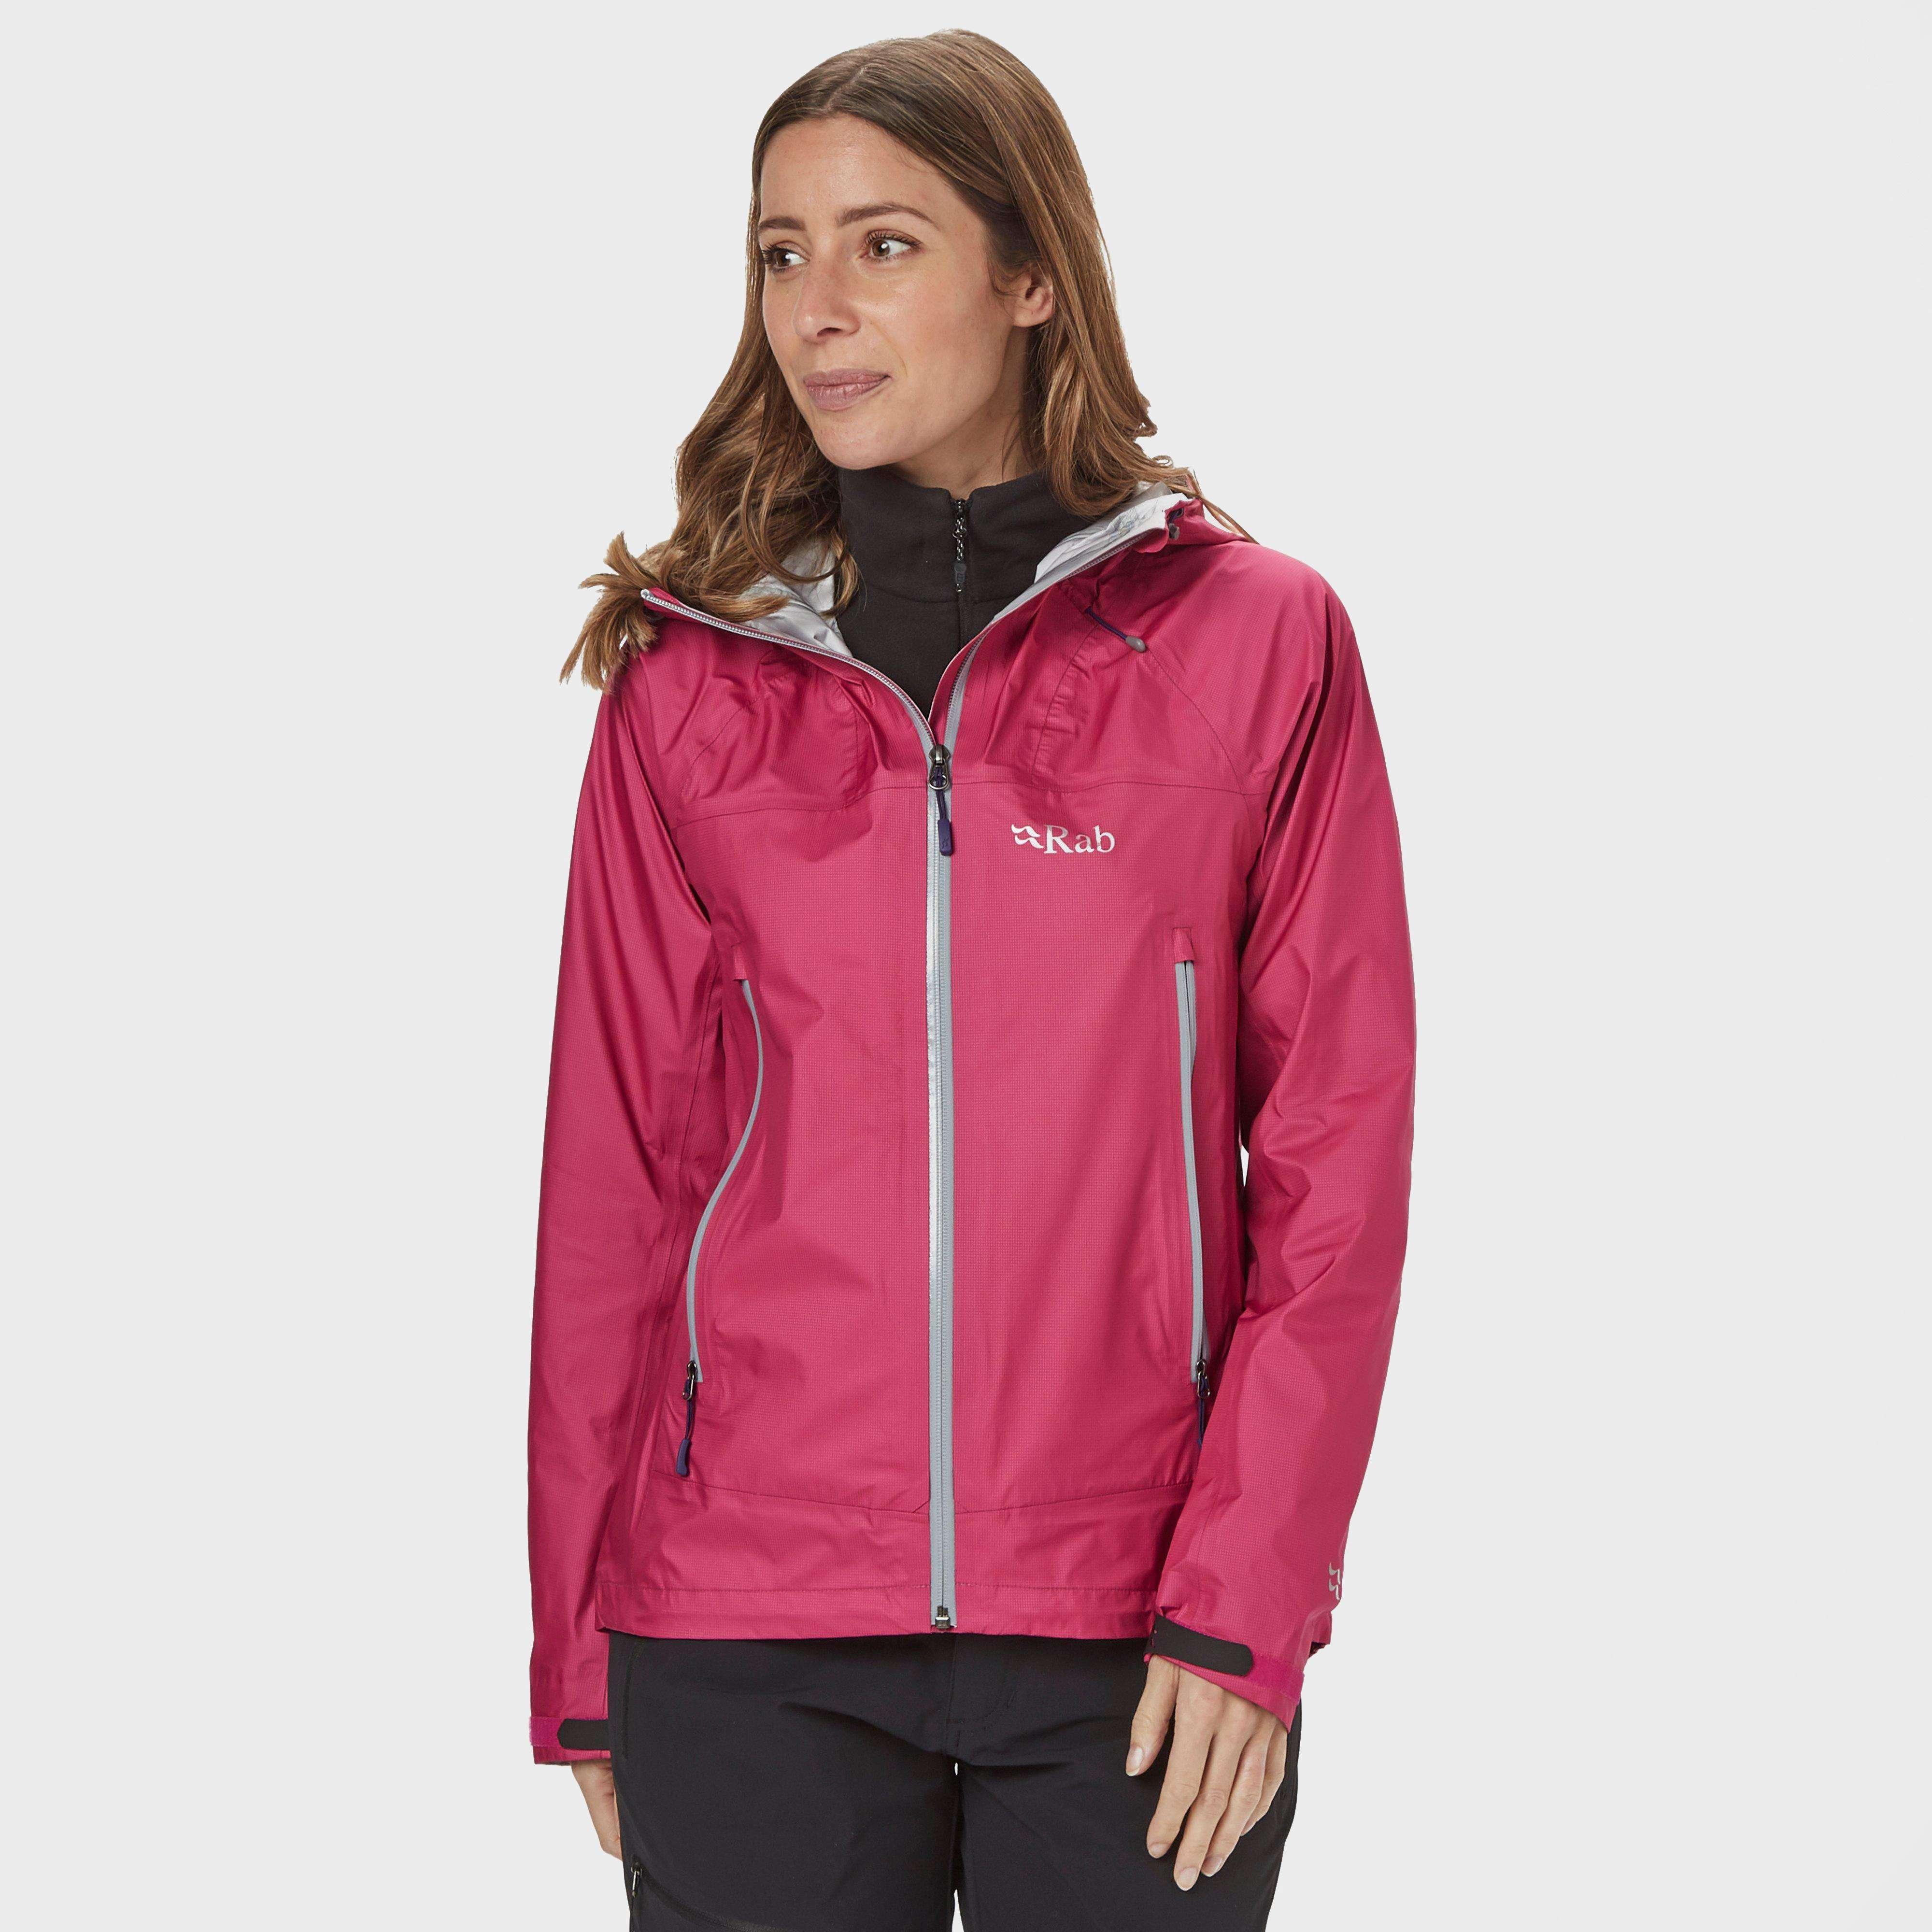 RAB Women's Muztag eVent® Jacket